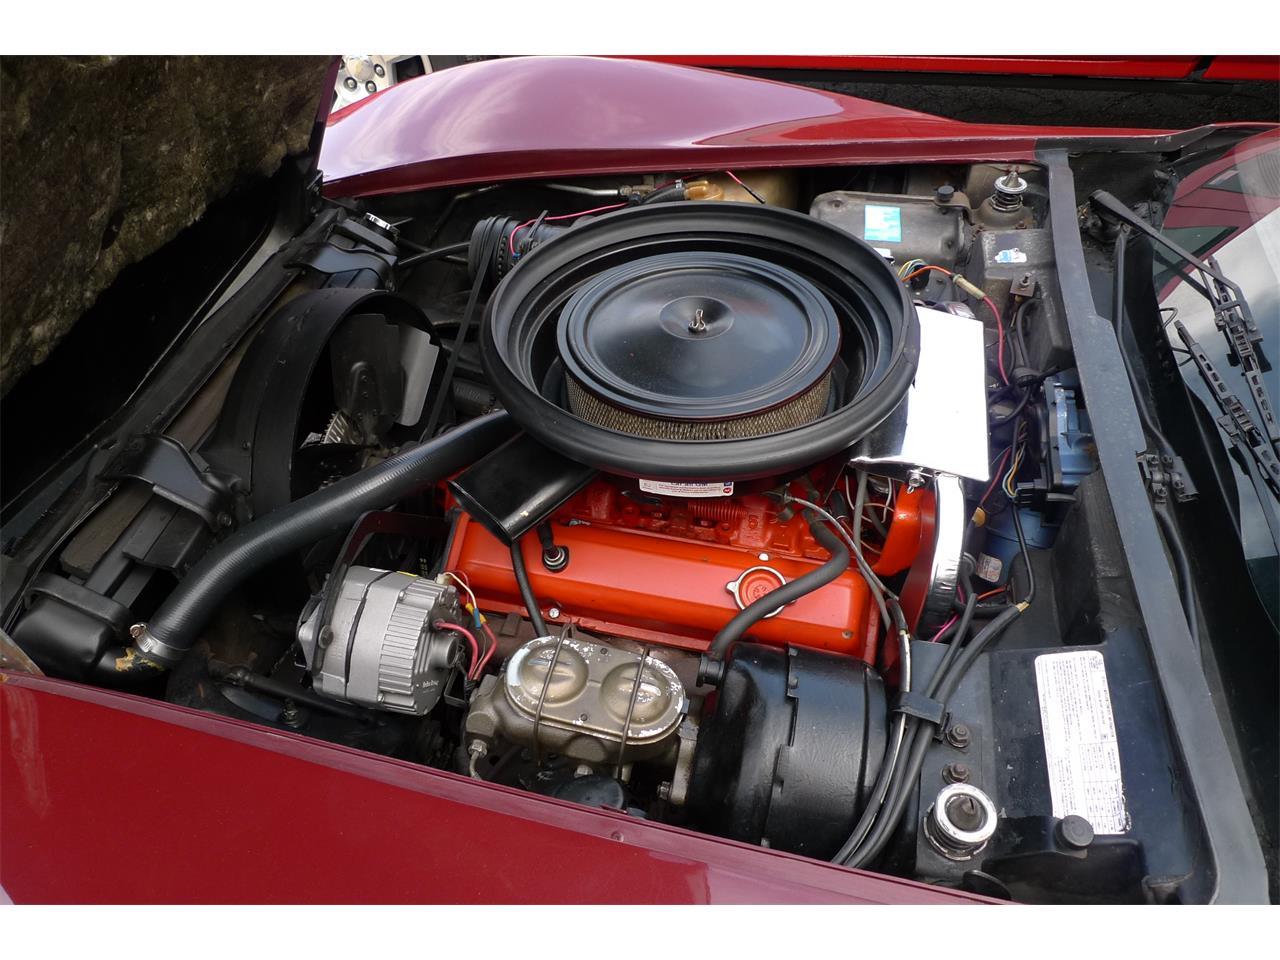 Large Picture of '75 Chevrolet Corvette - $20,975.00 Offered by Coast Corvette - L2GP